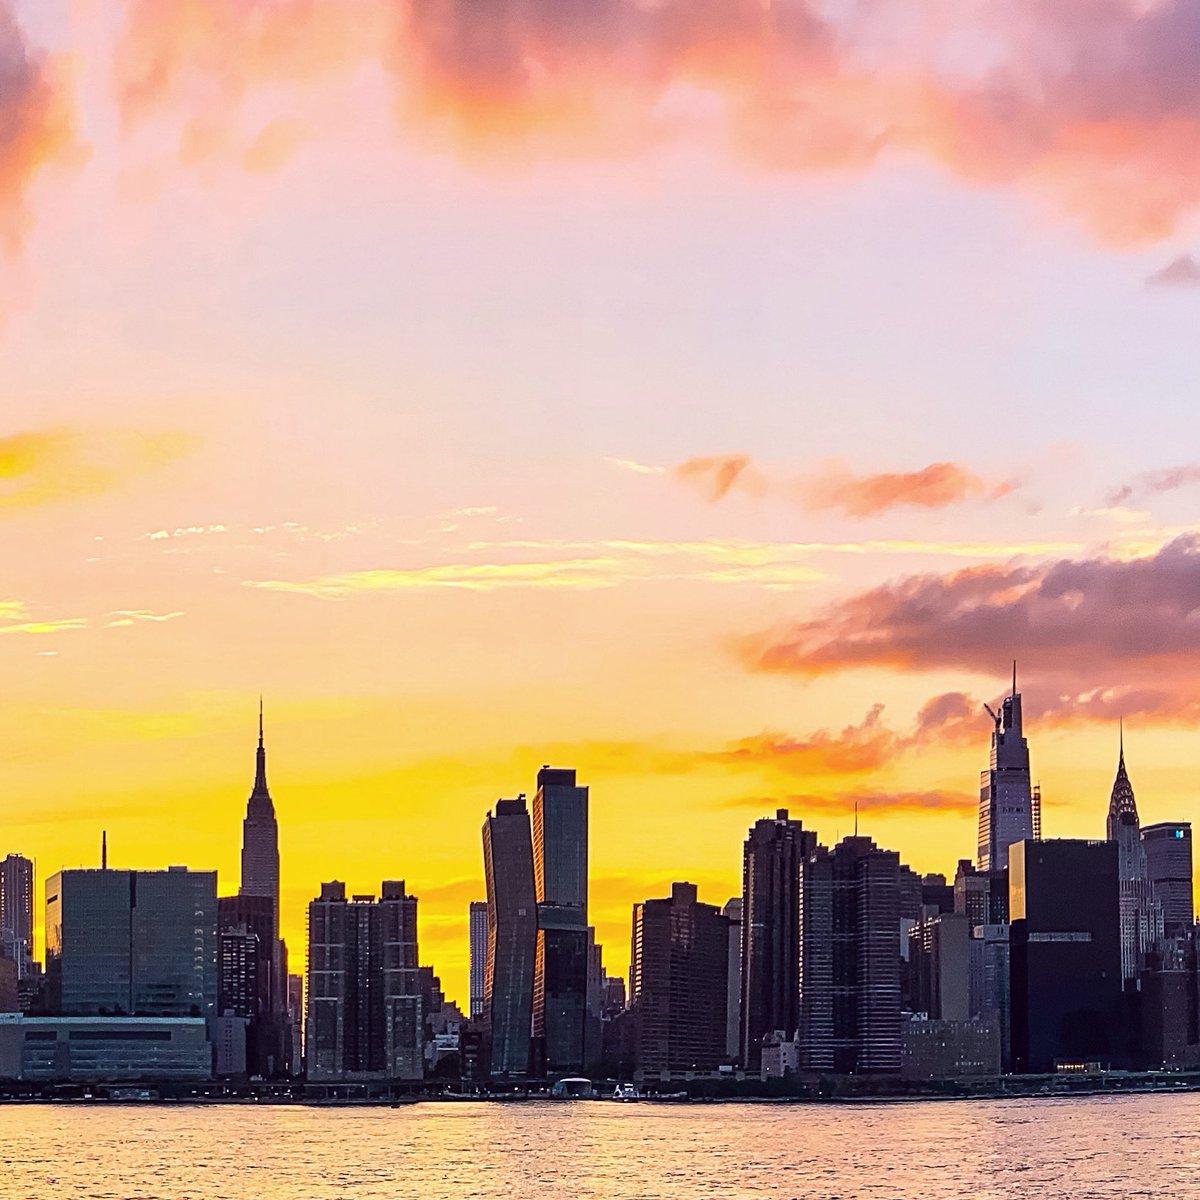 Find your spark. ⚡️ #shotoniPhone #Sunset #NYC 🗽 @EmpireStateBldg @nycfeelings @nycgo @nycfeelings @nycgov @TimeOutNewYork #Manhattan #NewYorkCity #NewYork #NewYork